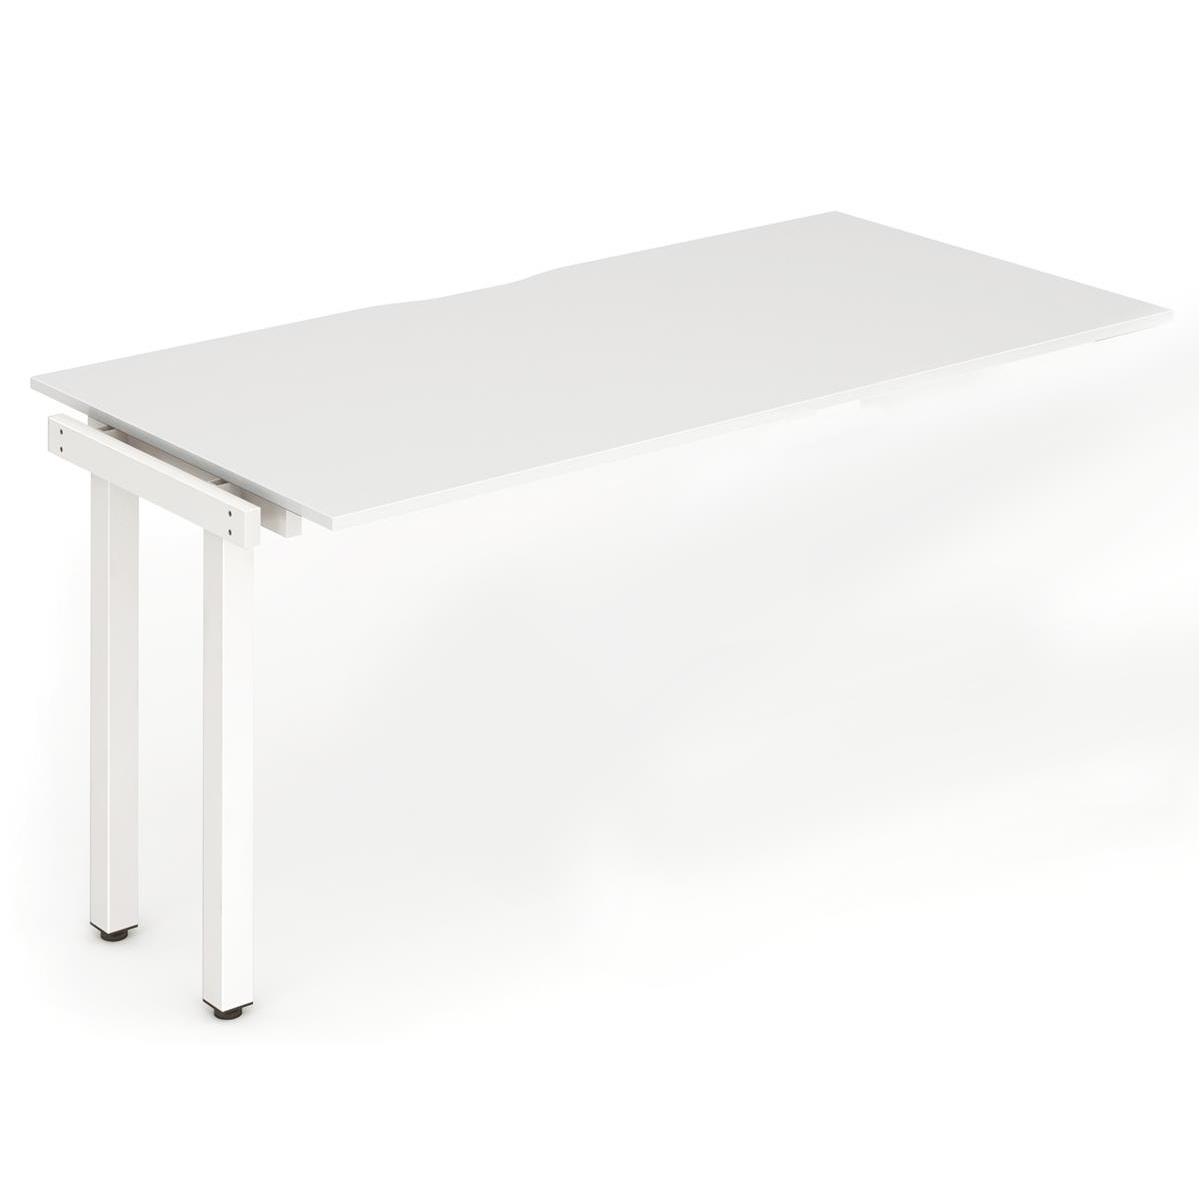 Trexus Bench Desk Single Extension White Leg 1200x800mm White Ref BE320